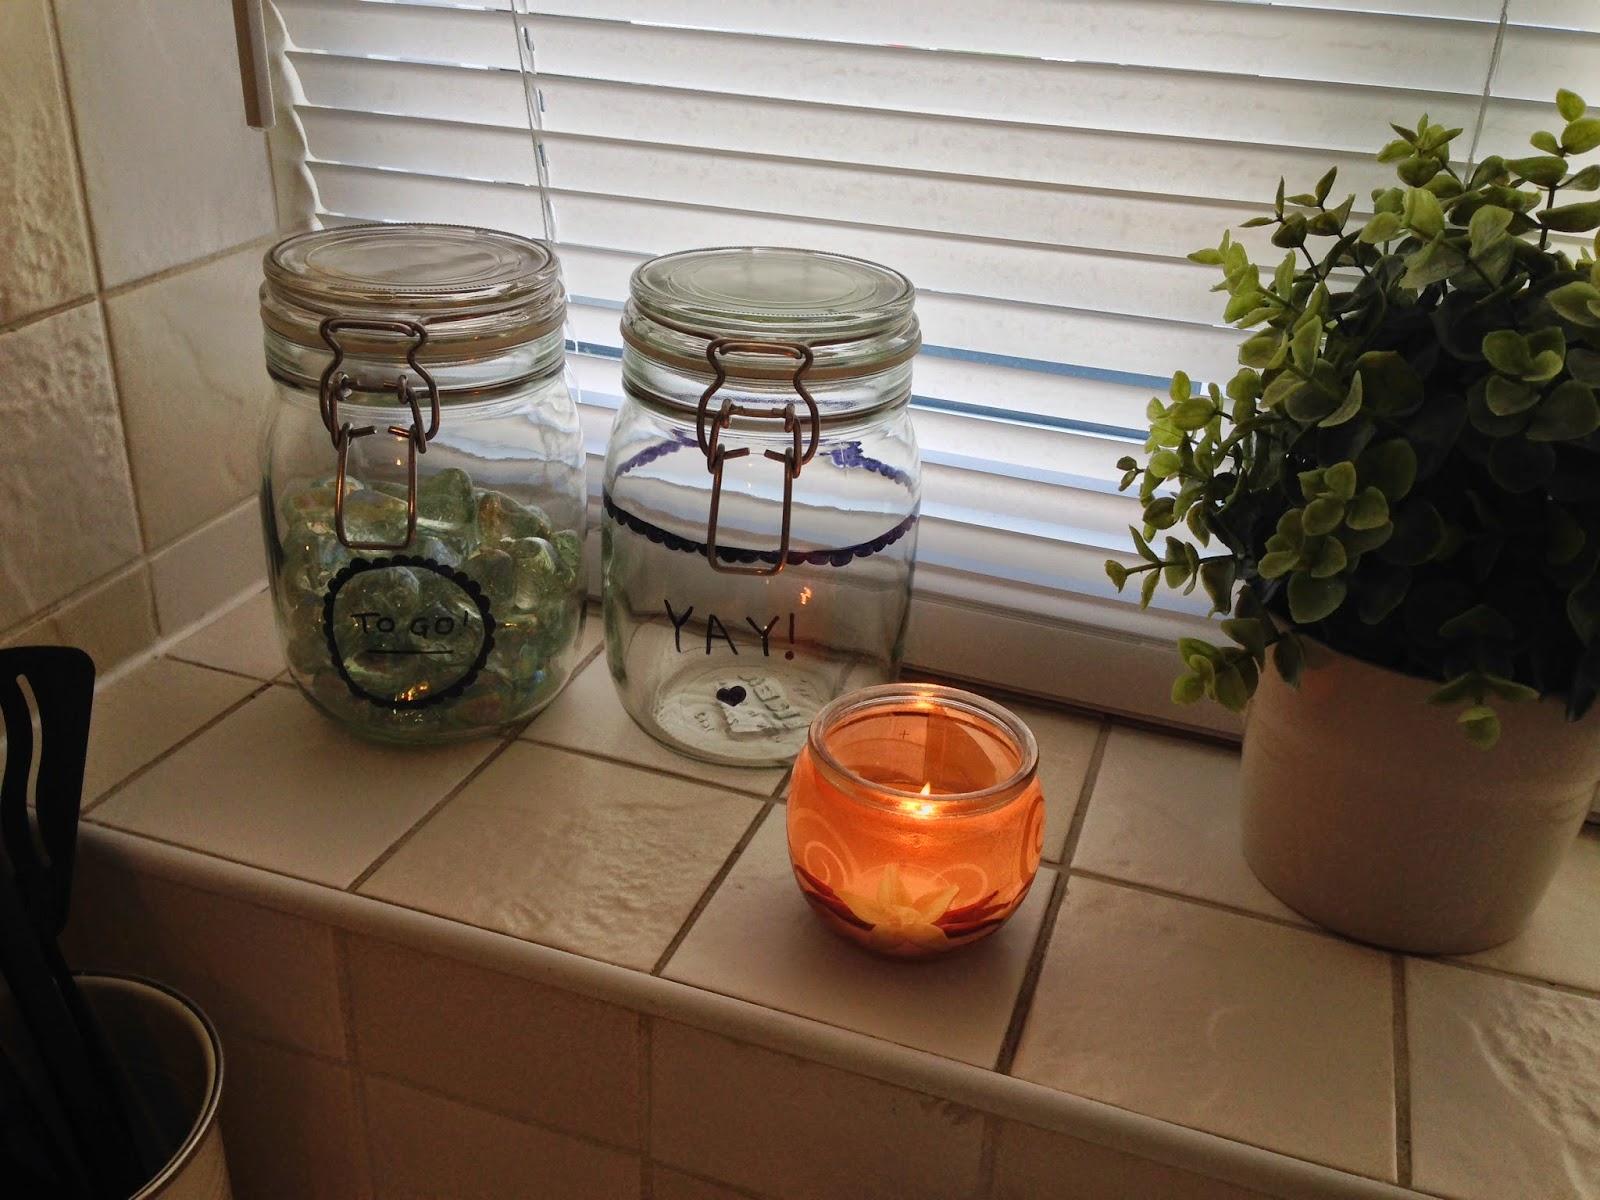 weight loss jars